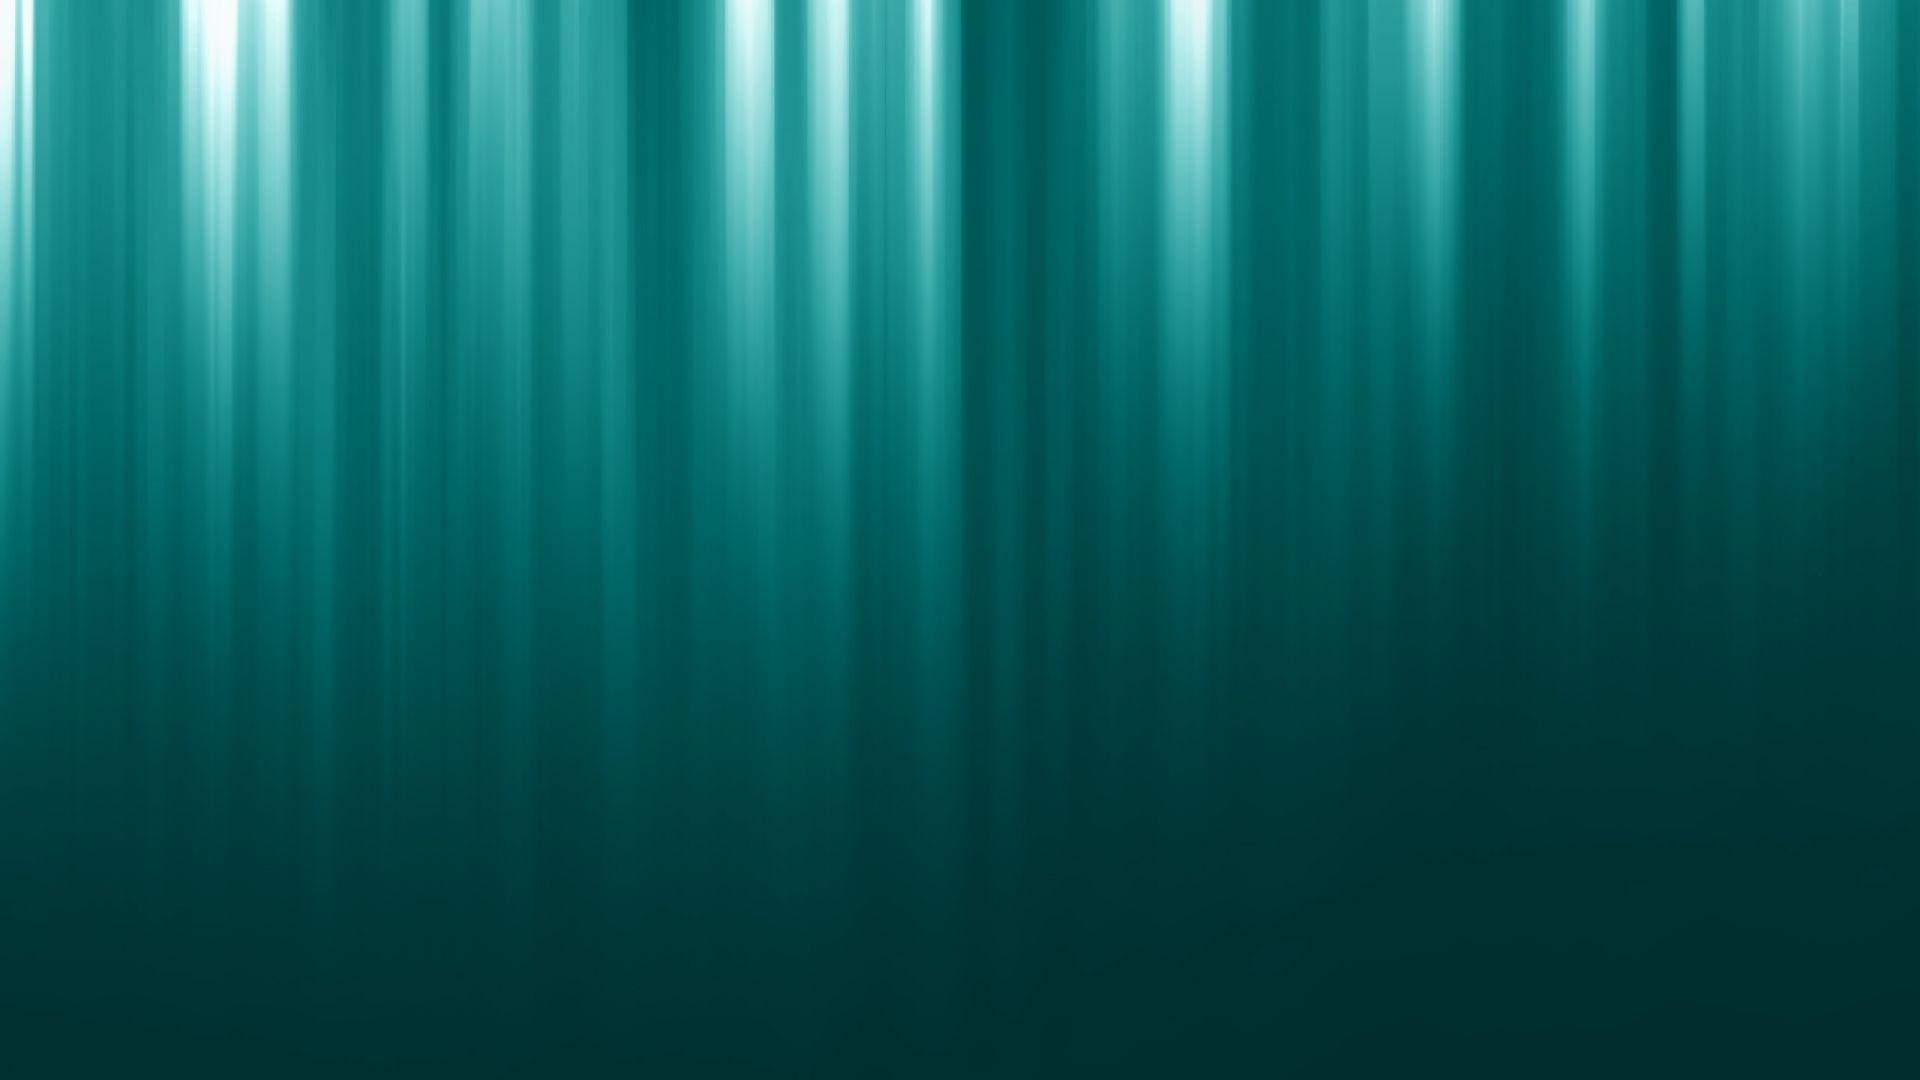 Dark Turquoise Background